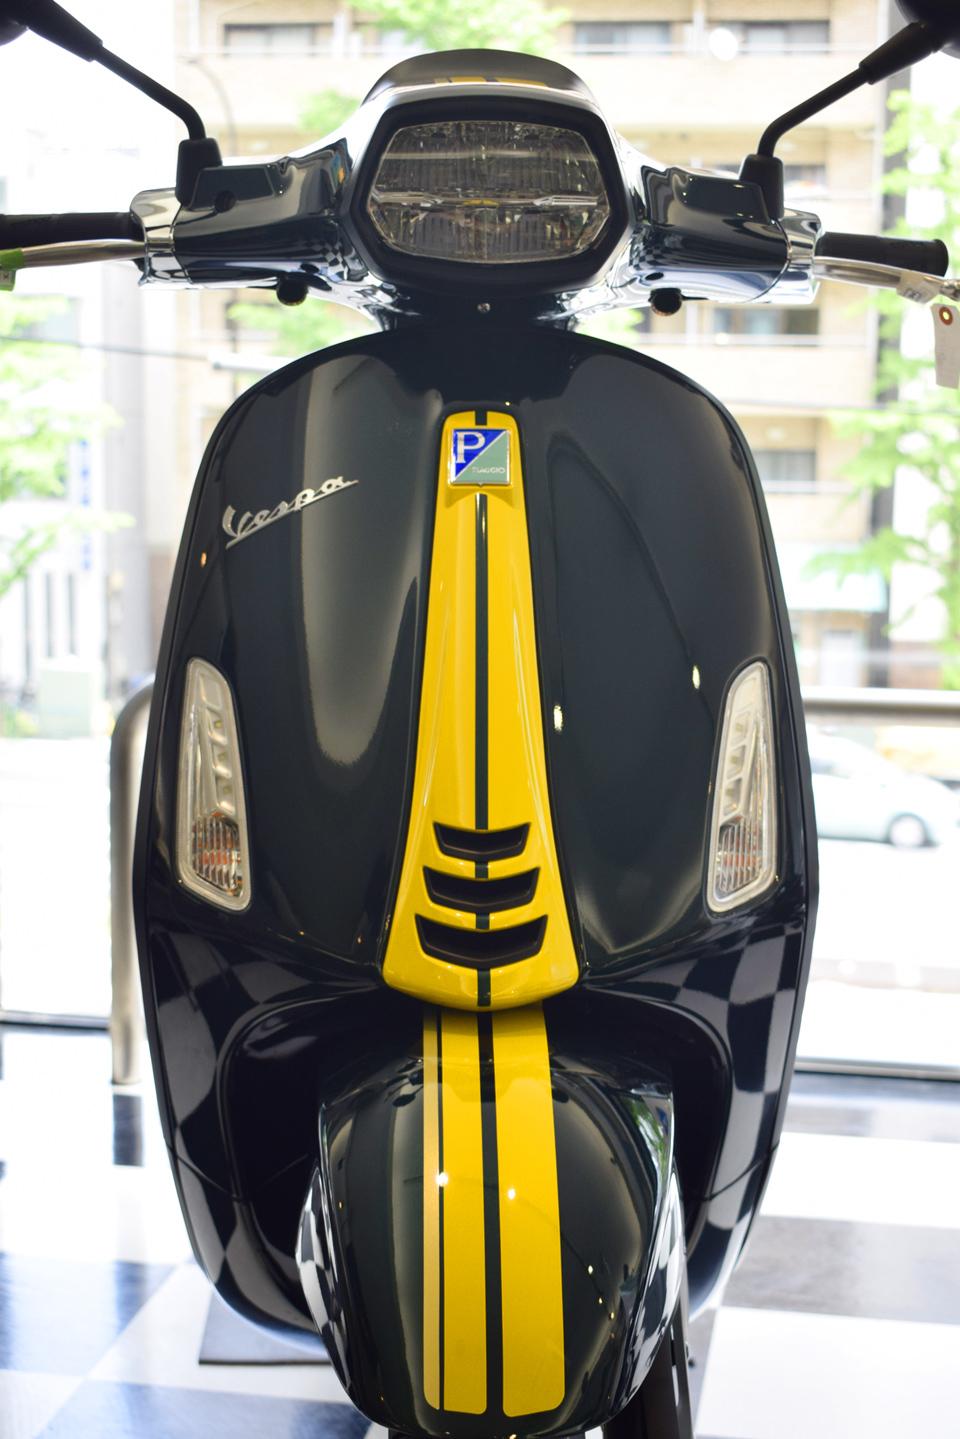 Vespa SPRINT RacingSixties ベスパ スプリント レーシングシックスティーズ 入荷♪_d0099181_15080933.jpg